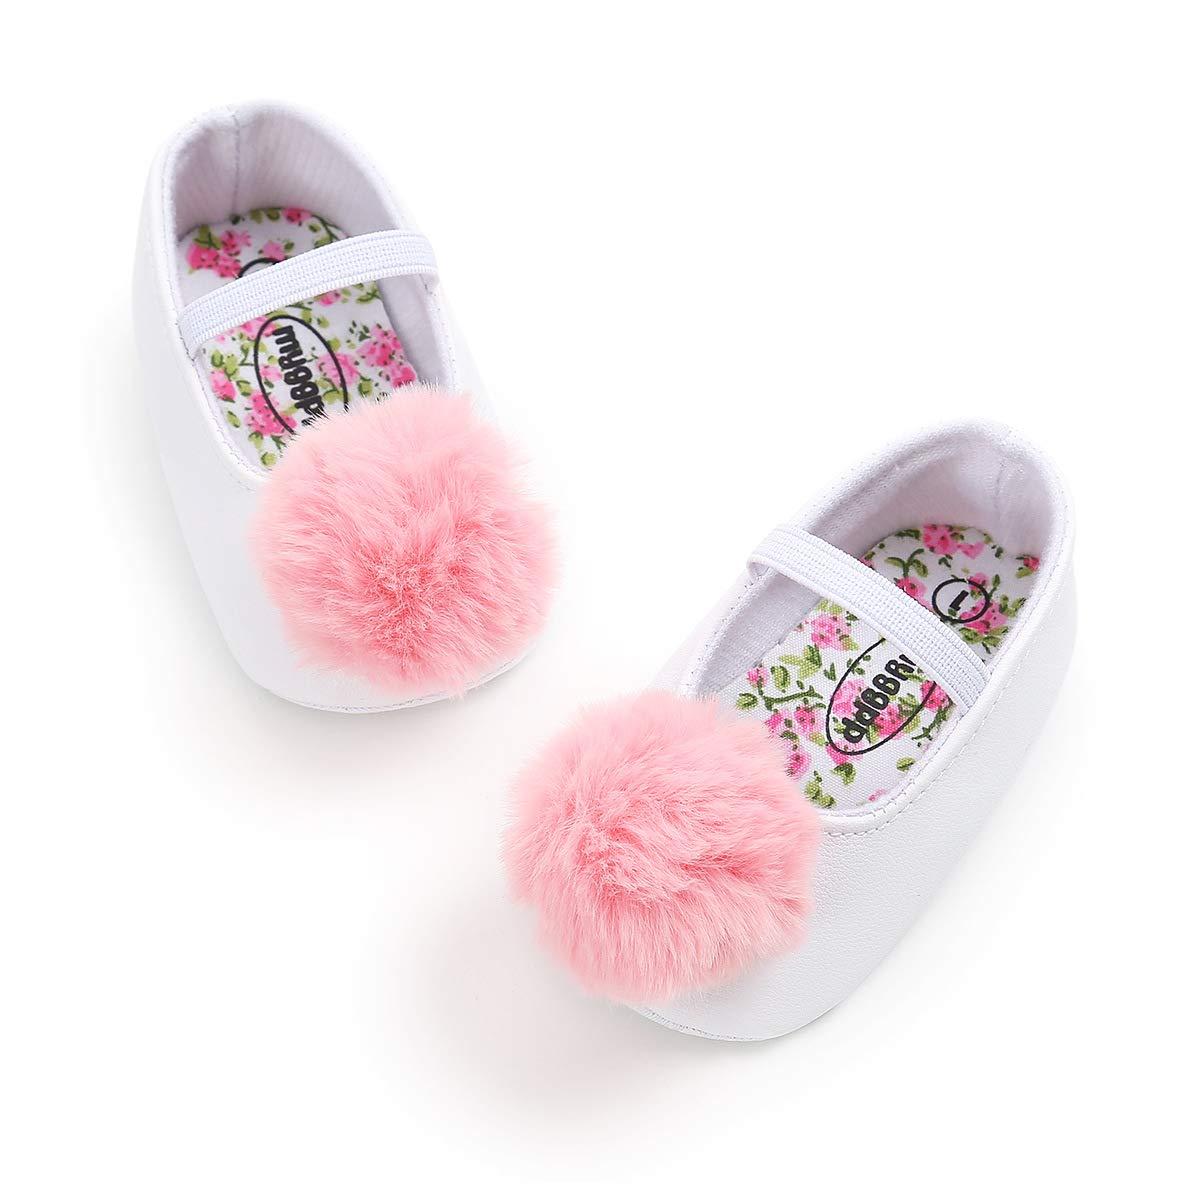 Baby Girls Mary Jane Flats Pom Pom Soft Sole Shoes Floral No-Slip Toddler Princess Dress Shoes